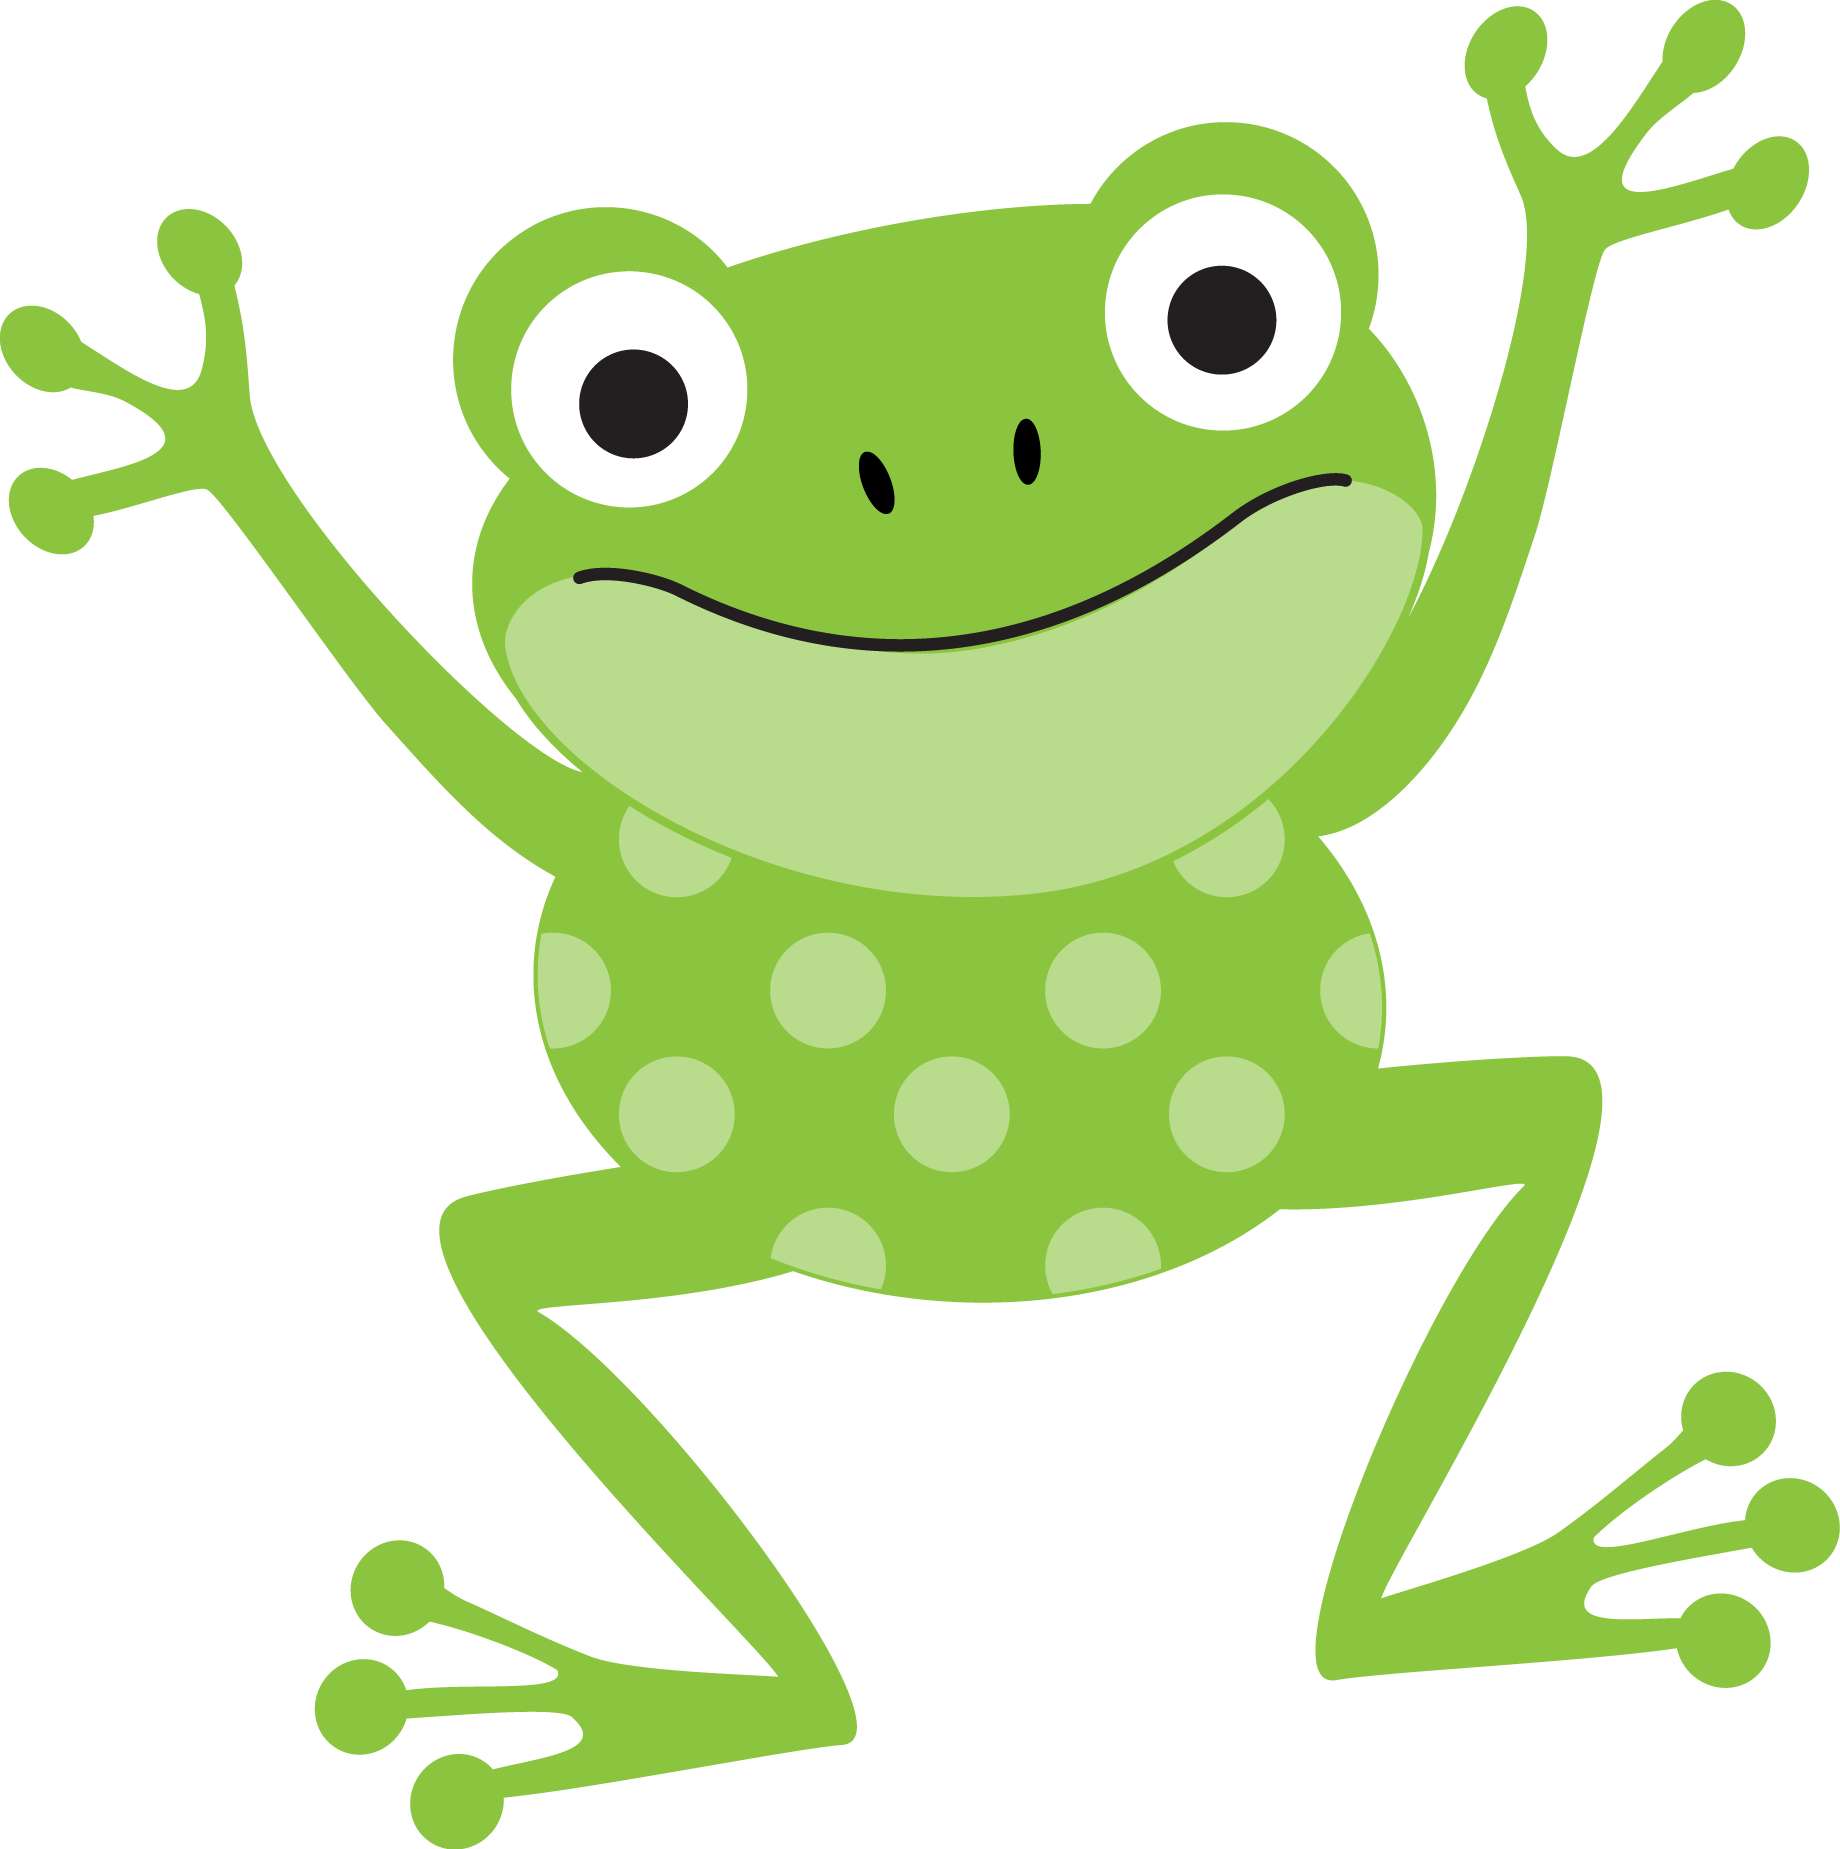 ○••°‿✿⁀ Frogs ‿✿⁀°••○ | Clip Art Work | Pinterest | Frogs, Clip ...